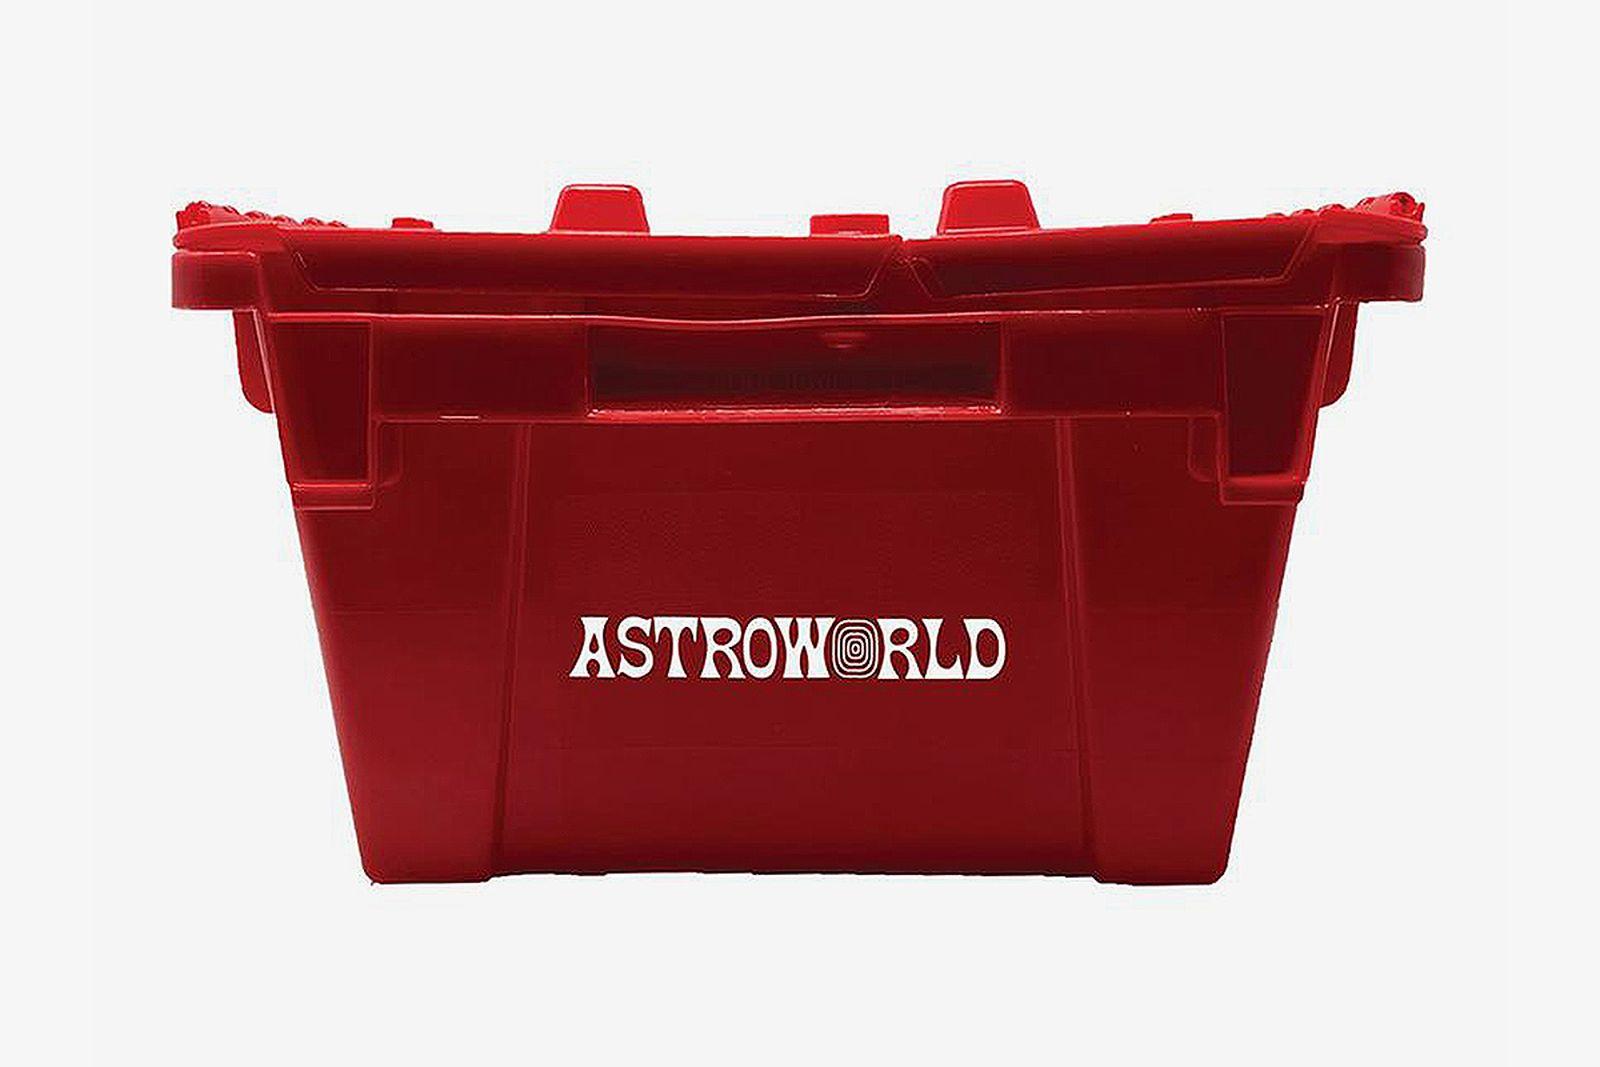 travis scott astroworld merch collection august 6 ASAP Ferg Merchandise brockhampton